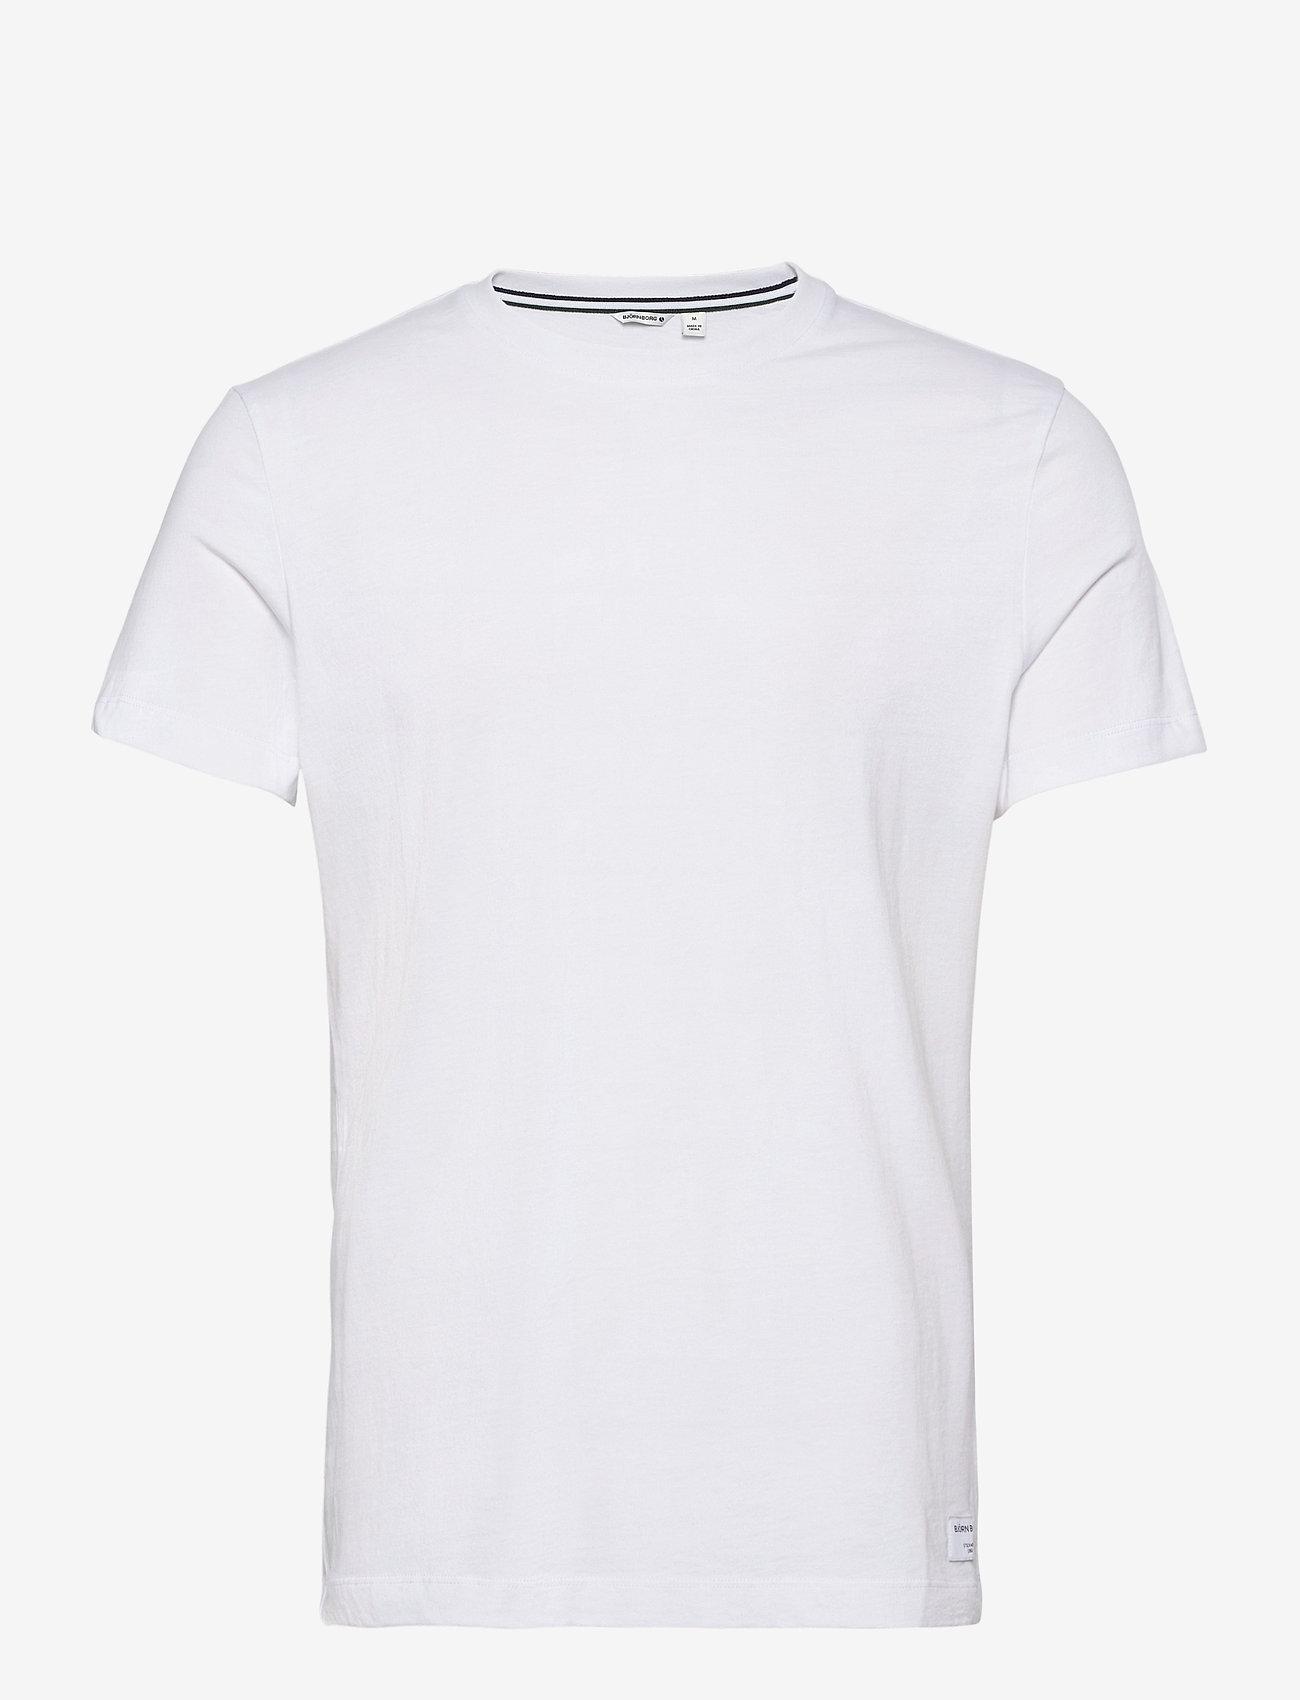 Björn Borg - TEE CENTRE CENTRE - basic t-shirts - brilliant white - 0